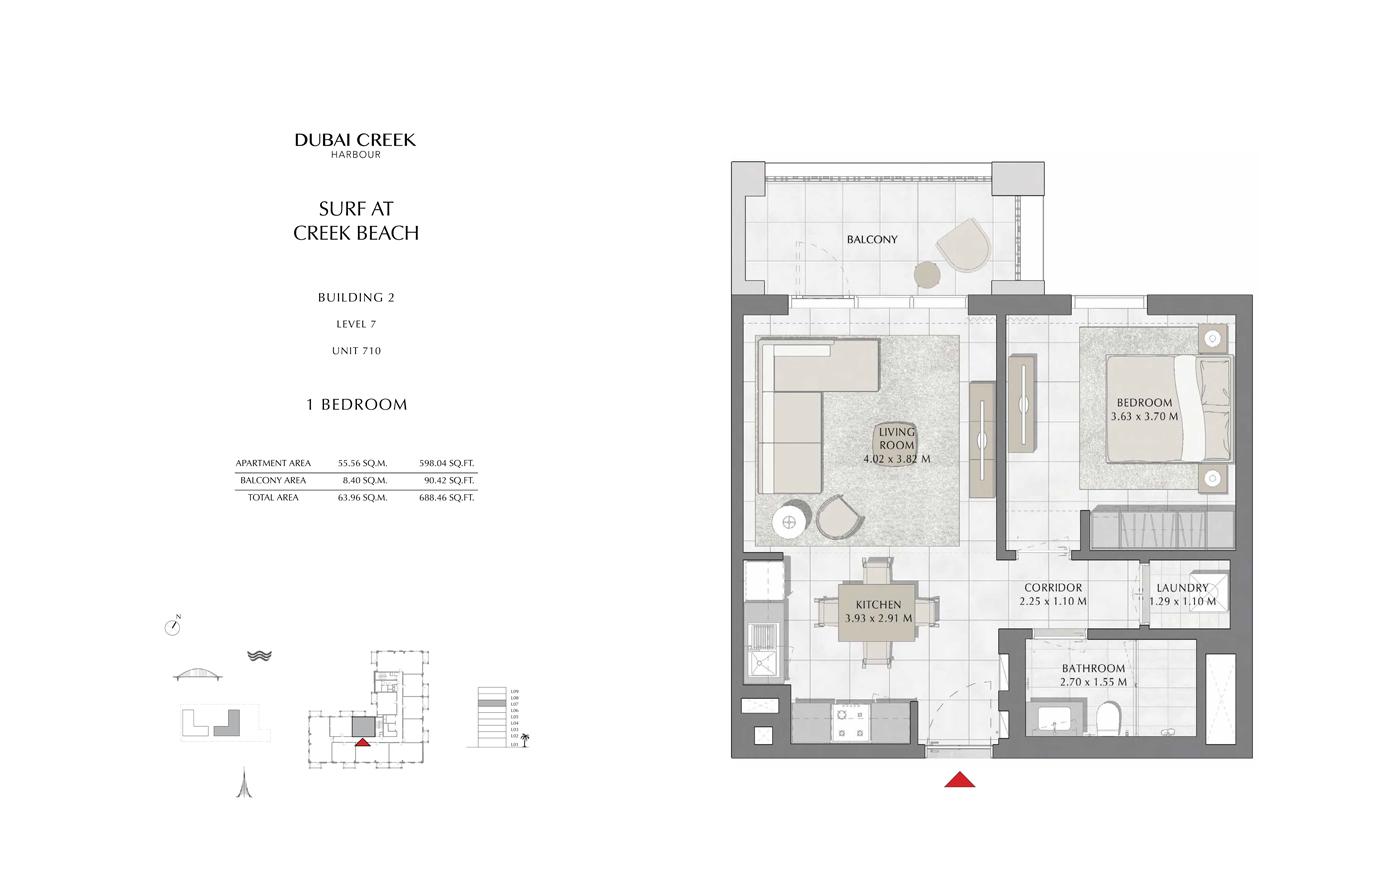 Building 2, 1 Bedroom Level 7, Unit 710, Size 688 Sq Ft